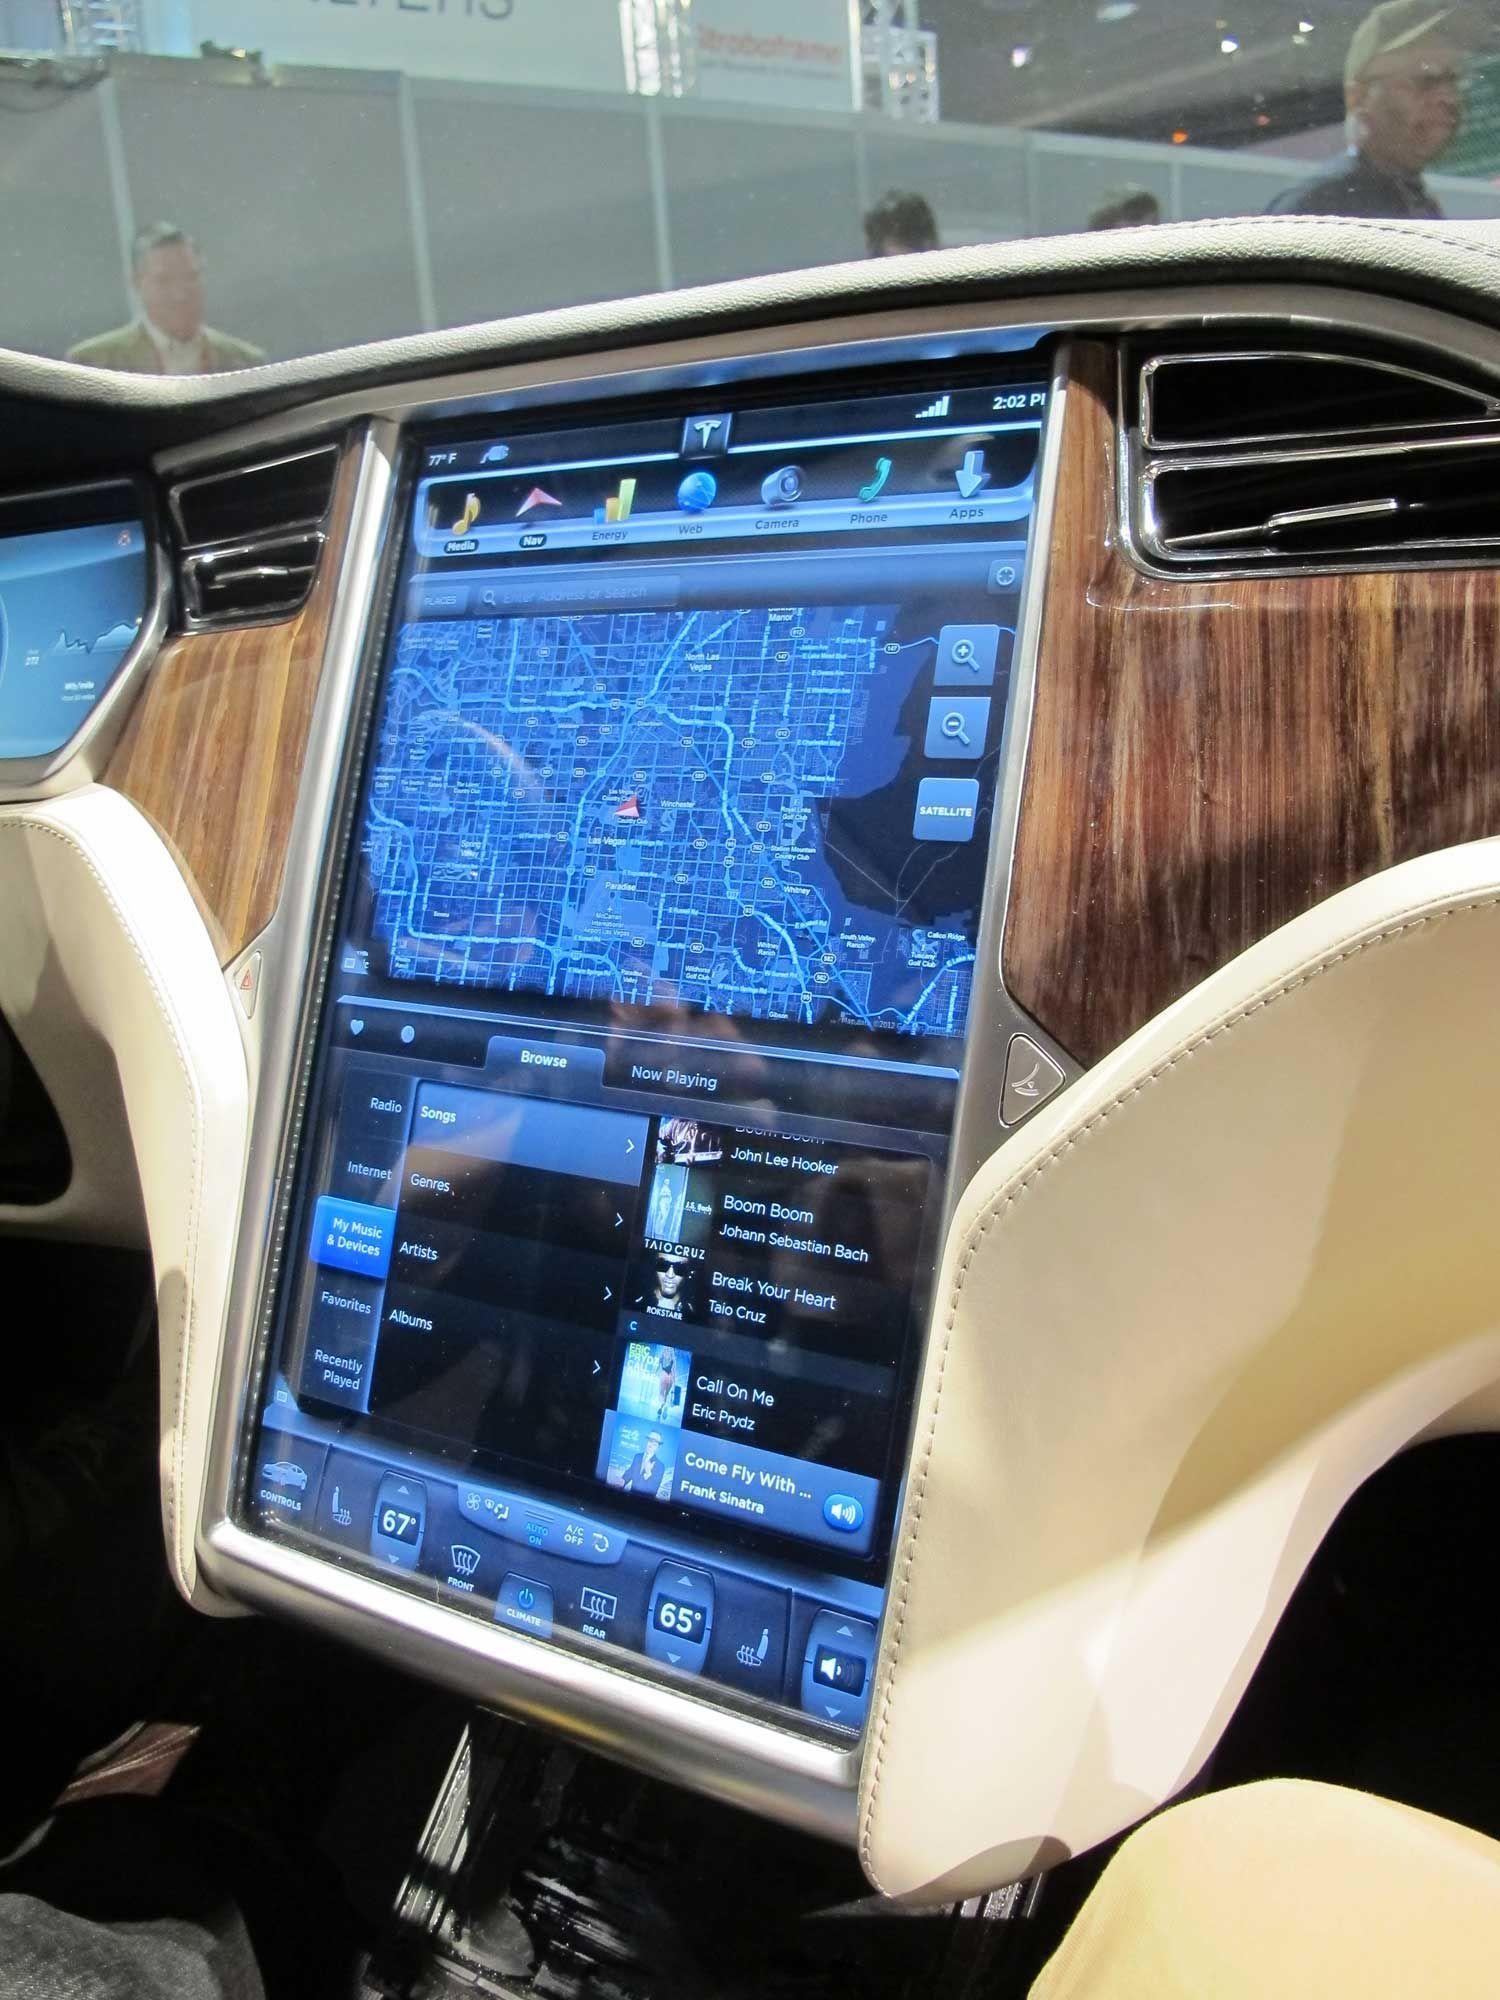 Economic Interior Design Ideas: 16+ Majestic Lifted Truck Wheels Ideas